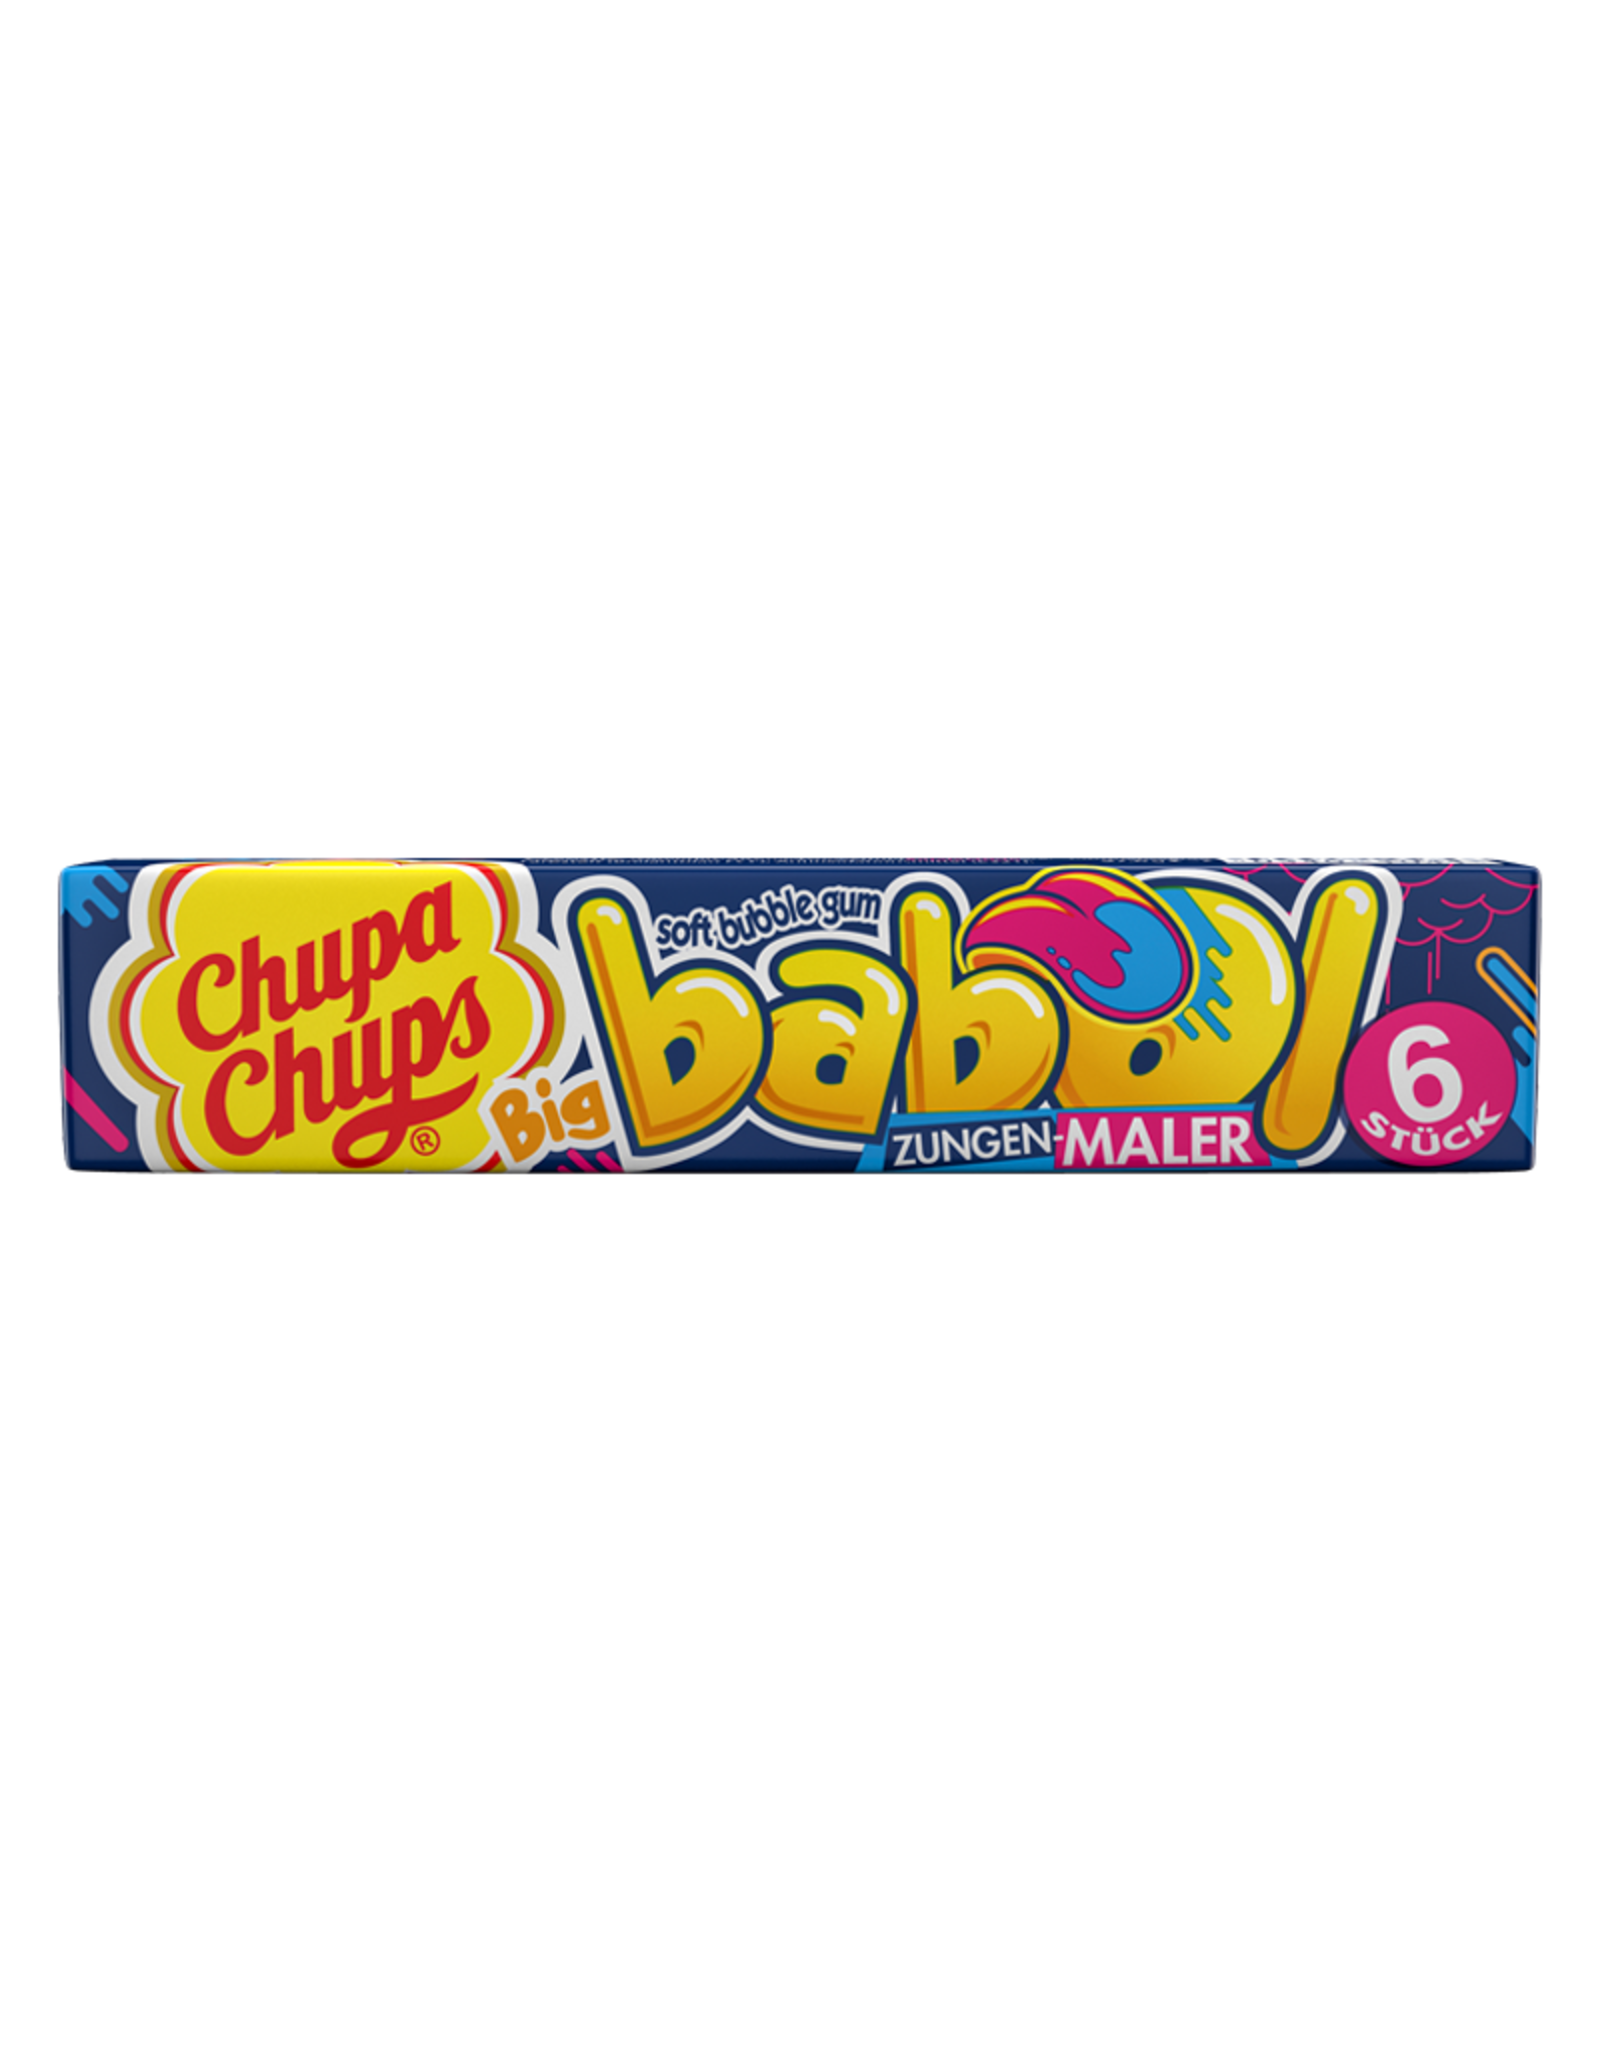 Chupa Chups Big Babol Bubblegum - ZungenMaler - 27,6g